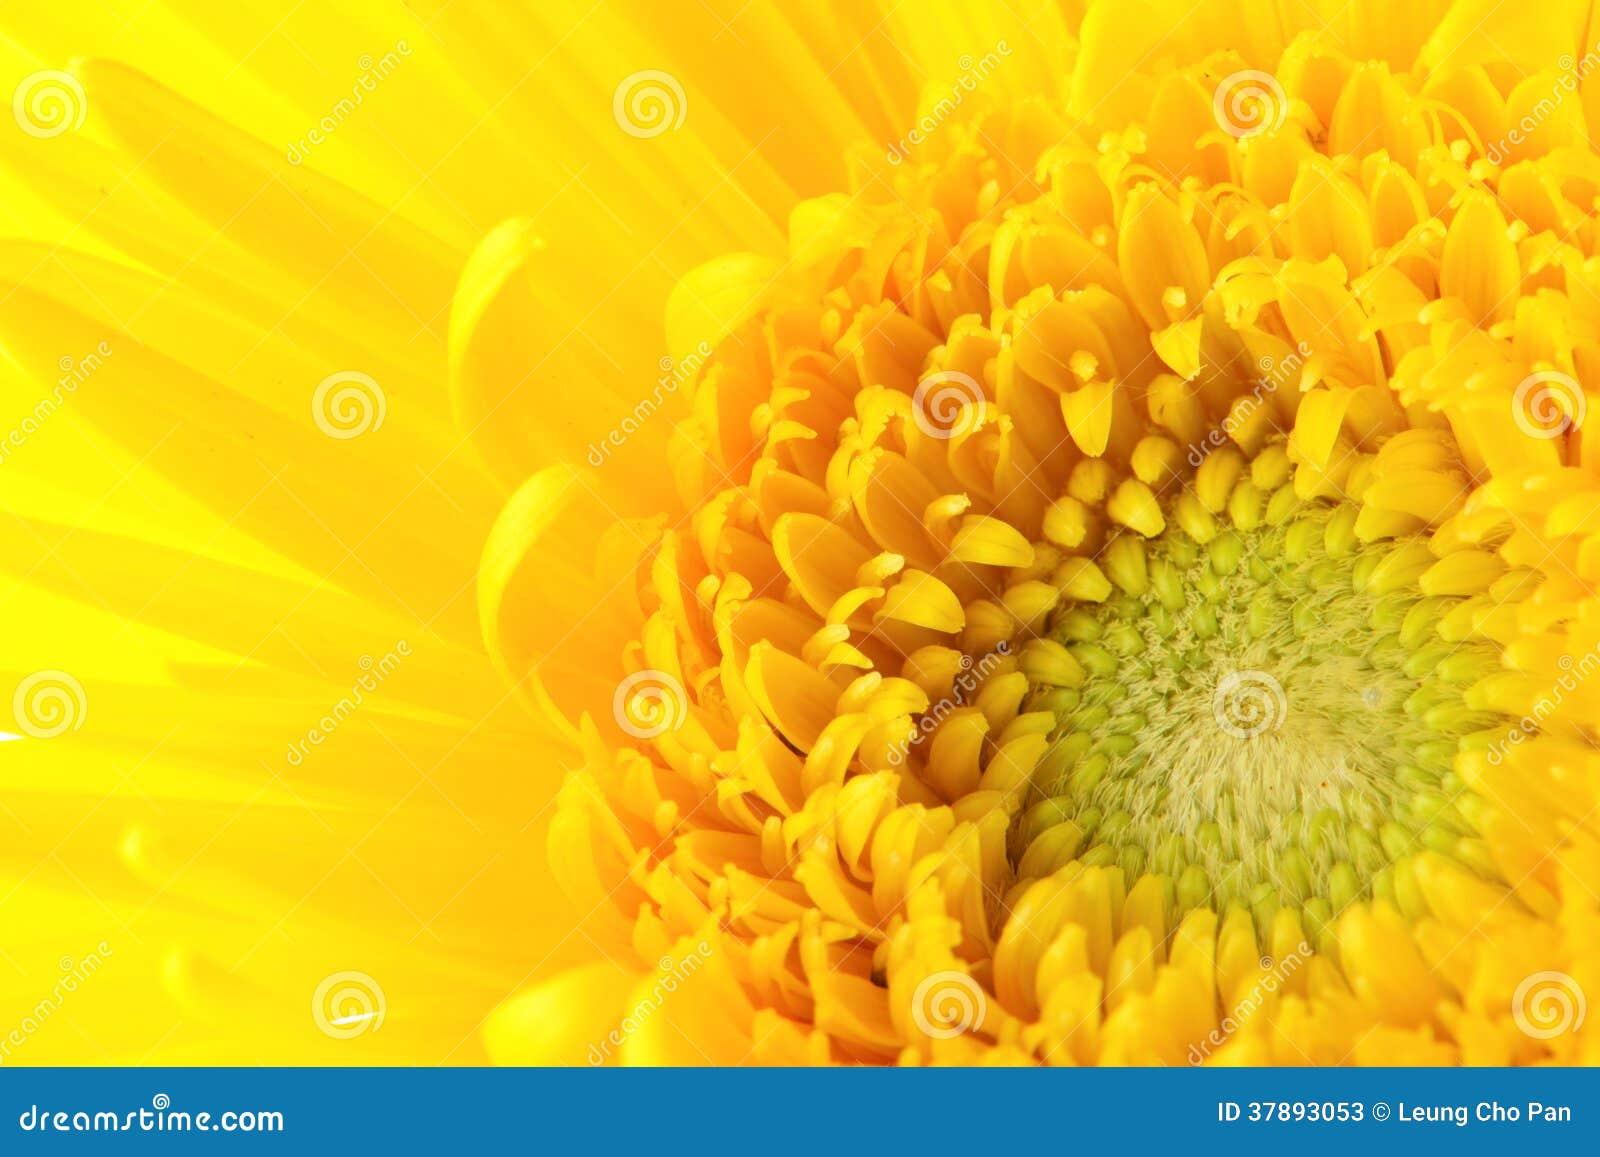 Gele madeliefje dichte omhooggaand